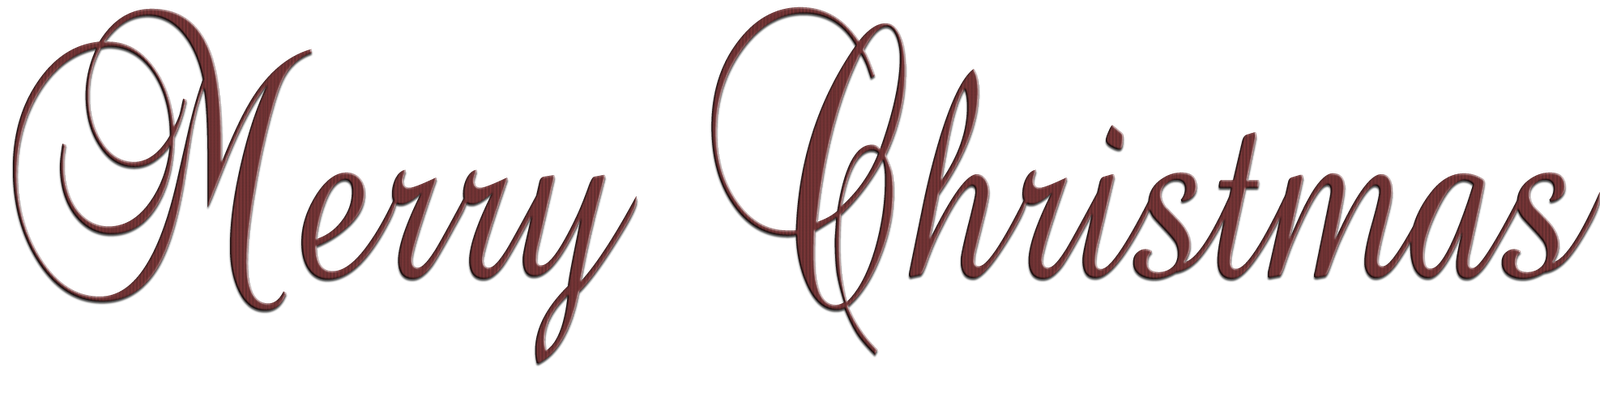 Merry christmas jesus clipart png transparent download Merry Christmas Text PNG Transparent Images | PNG All png transparent download